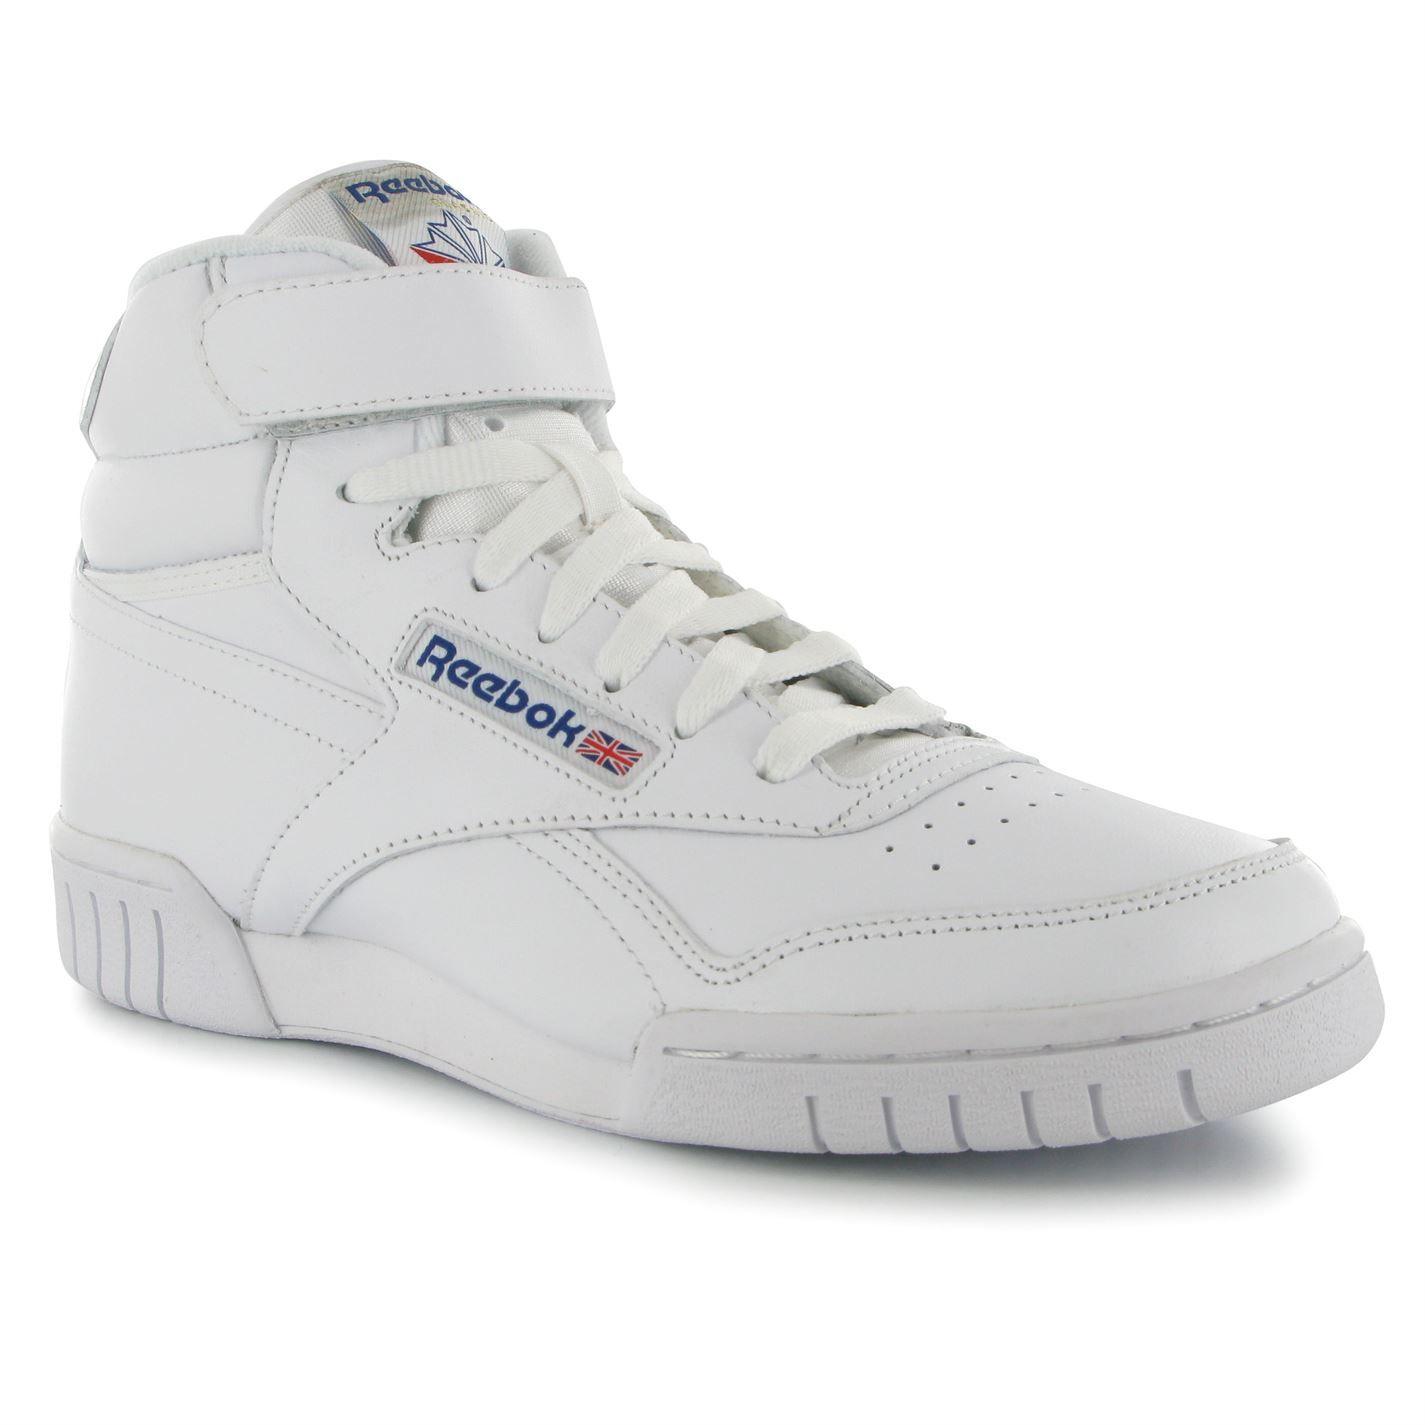 reebok high top sneakers men